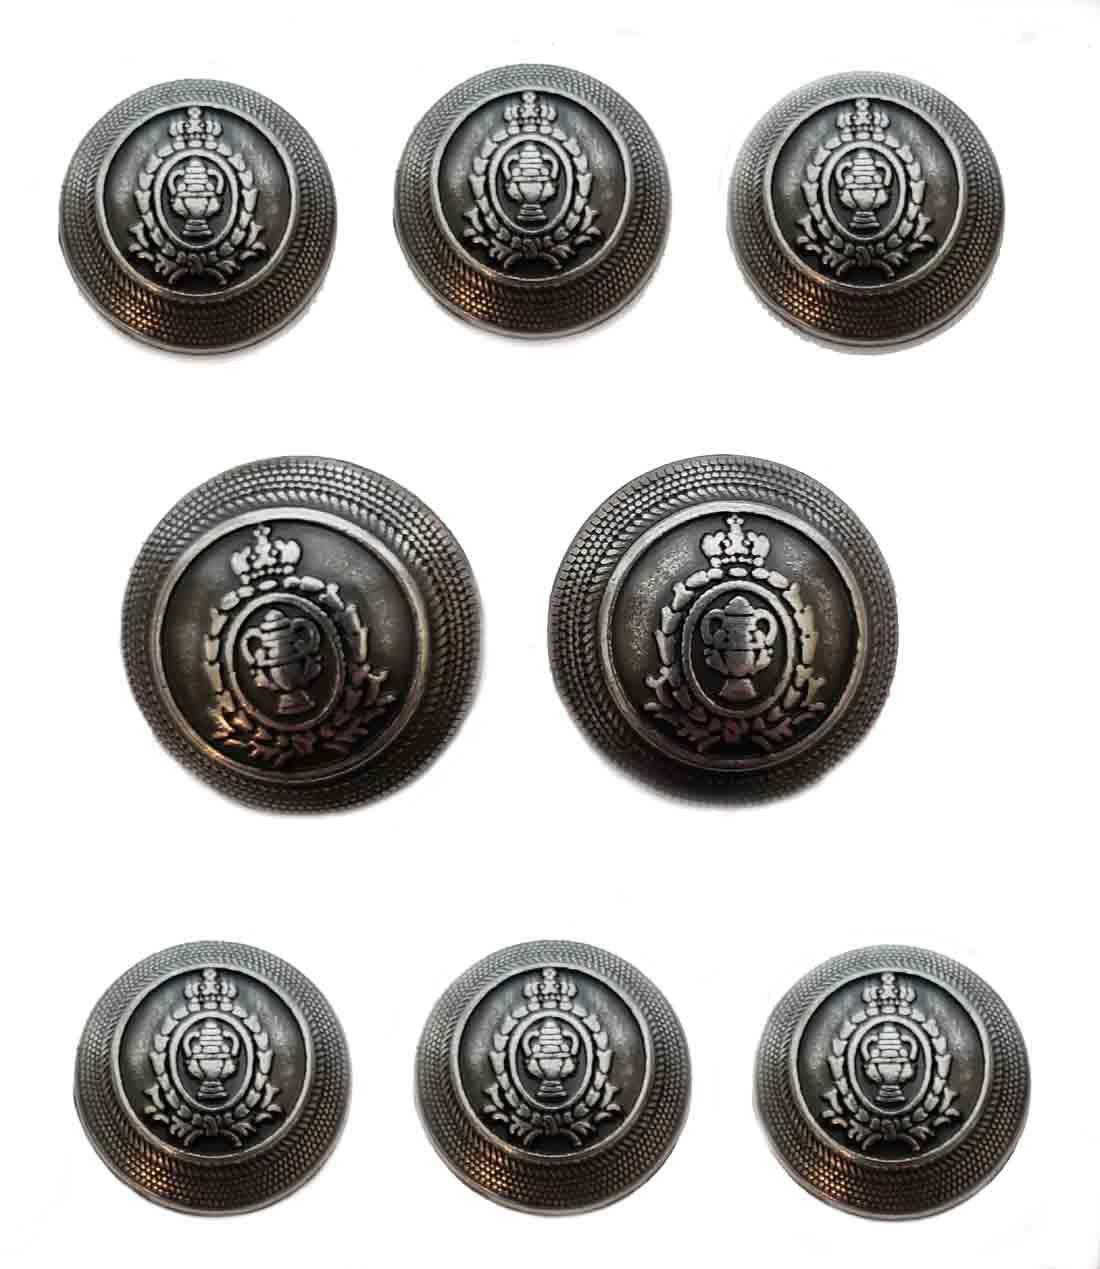 Aquascutum Dome Blazer Buttons Set Gray Silver Shank Metal Men's